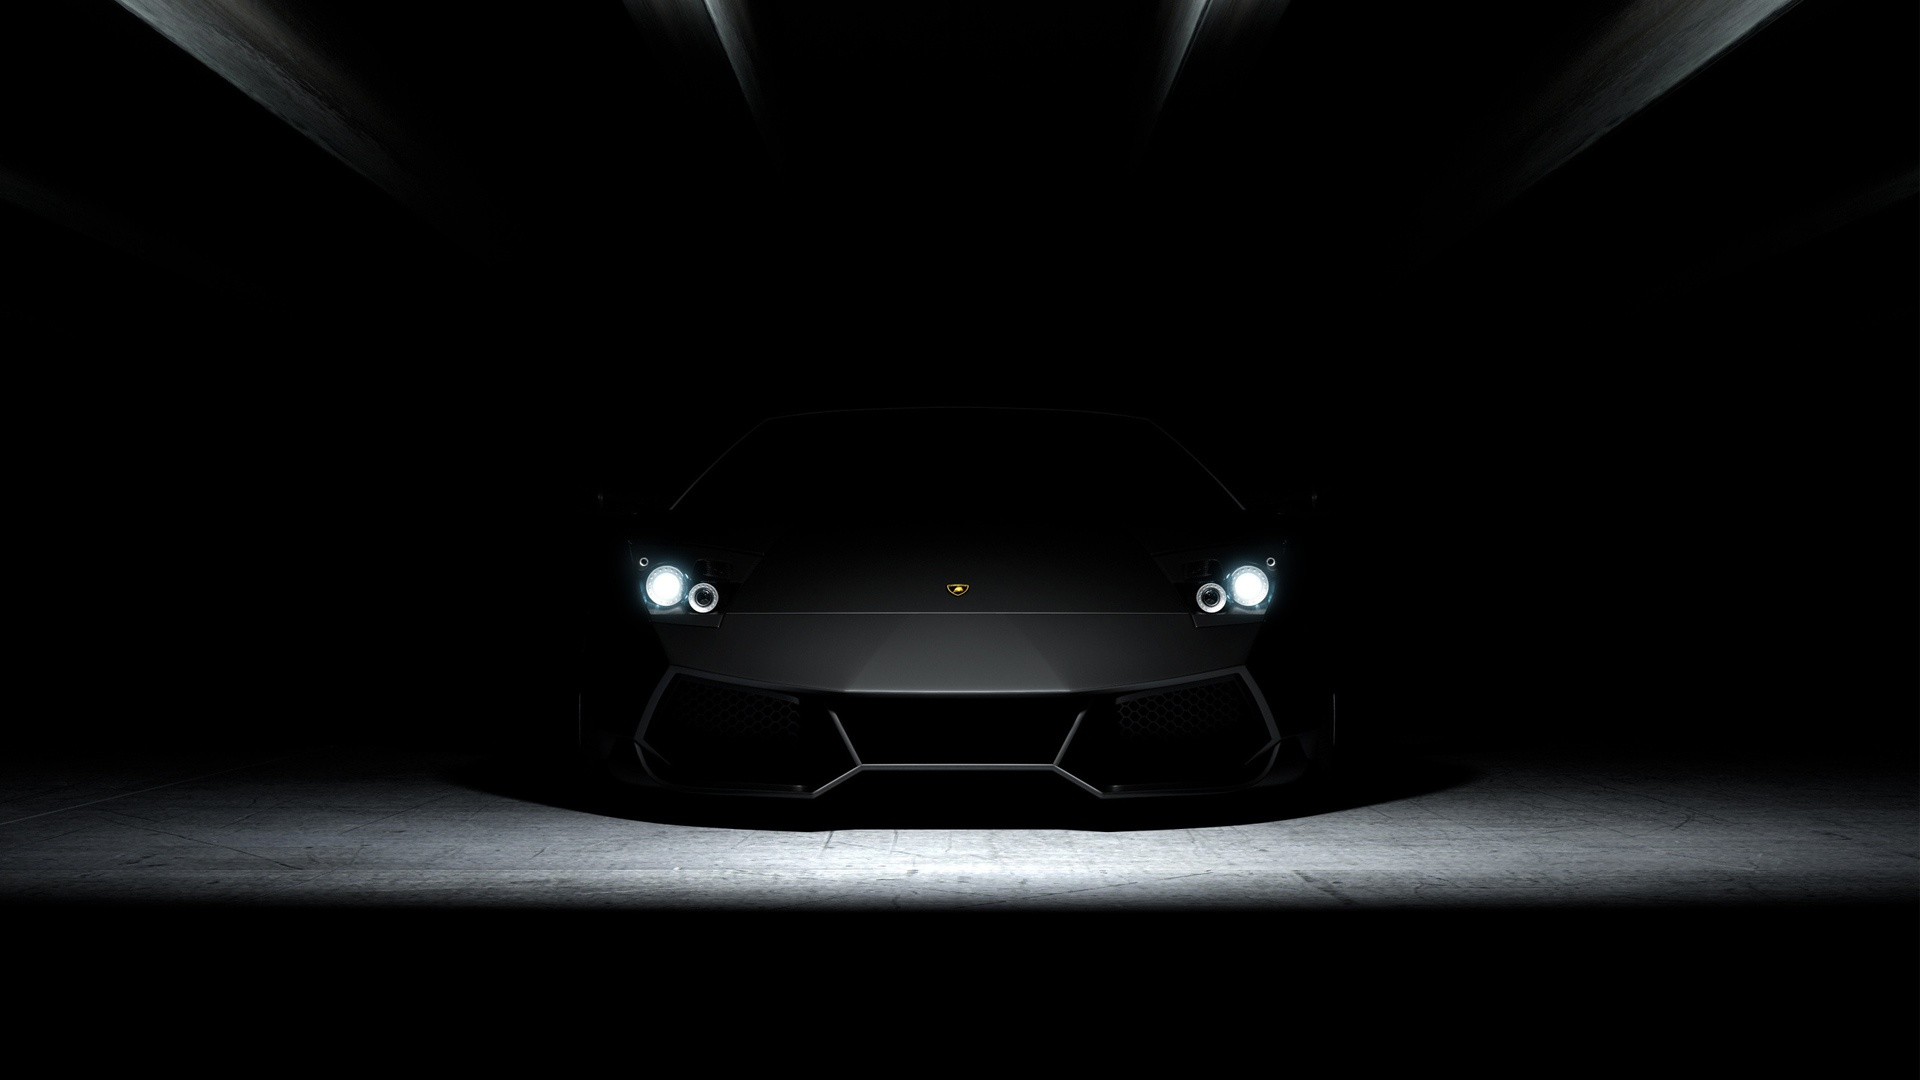 Muscle Car Hd Wallpapers 1080p Full Hd Backgrounds 1080p Cars Pixelstalk Net